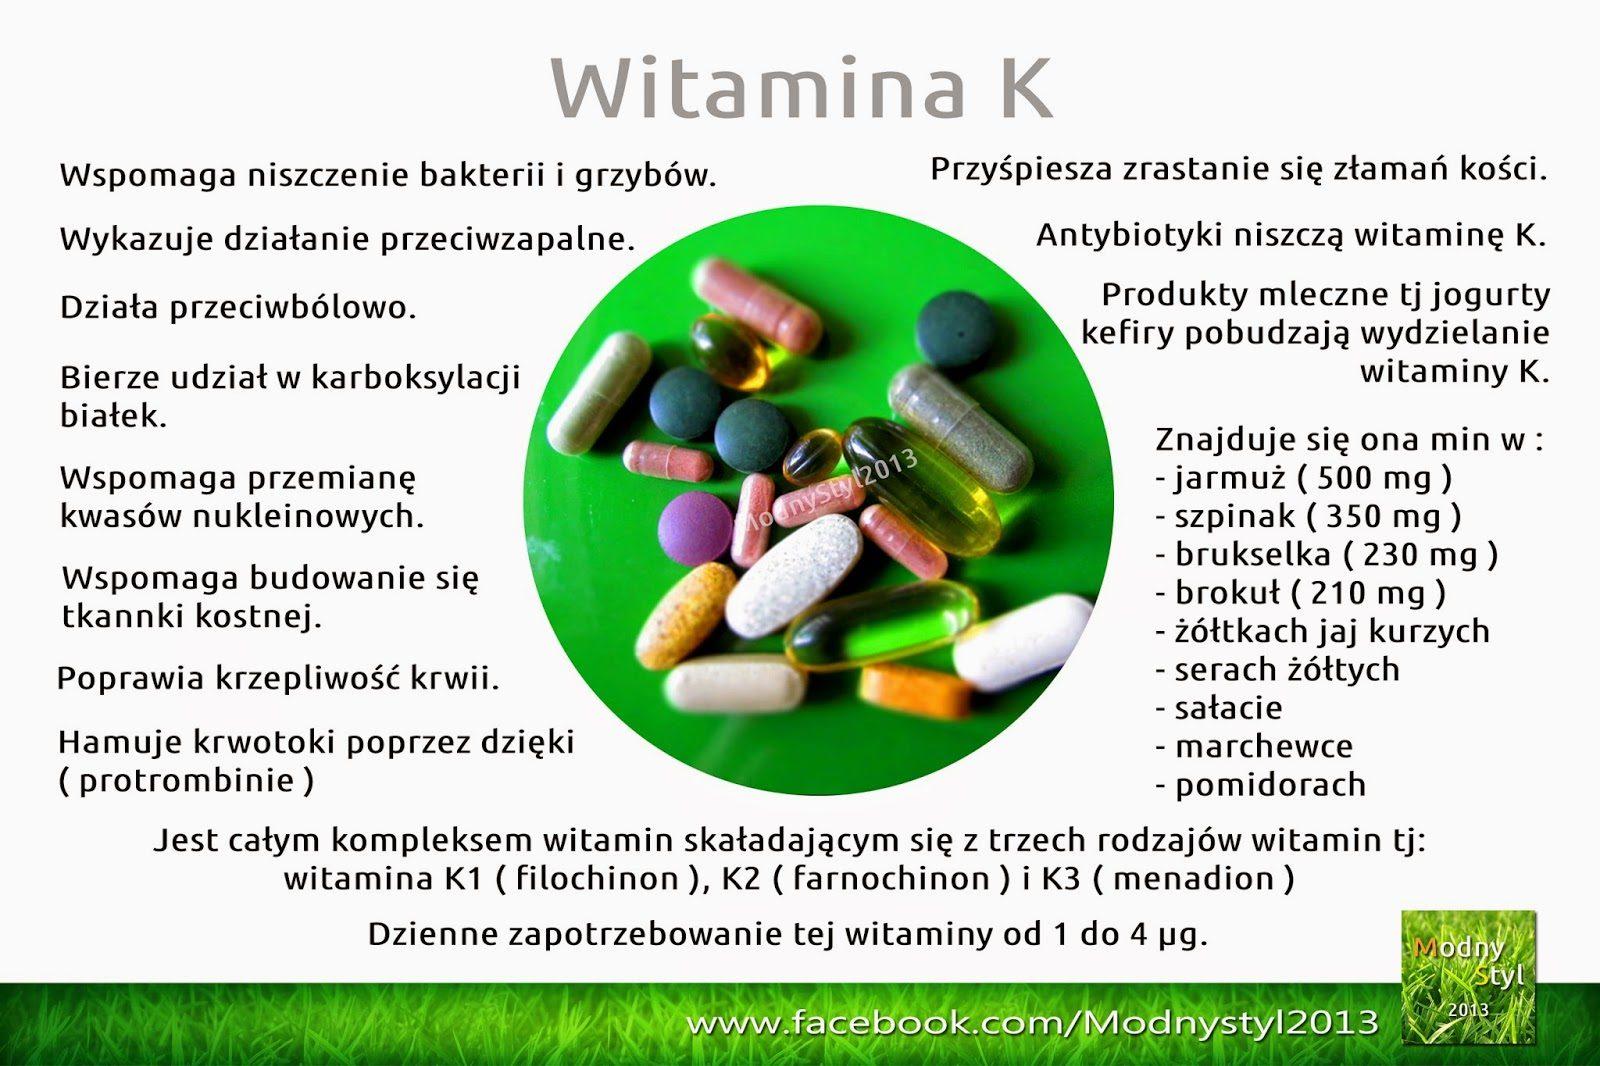 witamina2bk-2818746